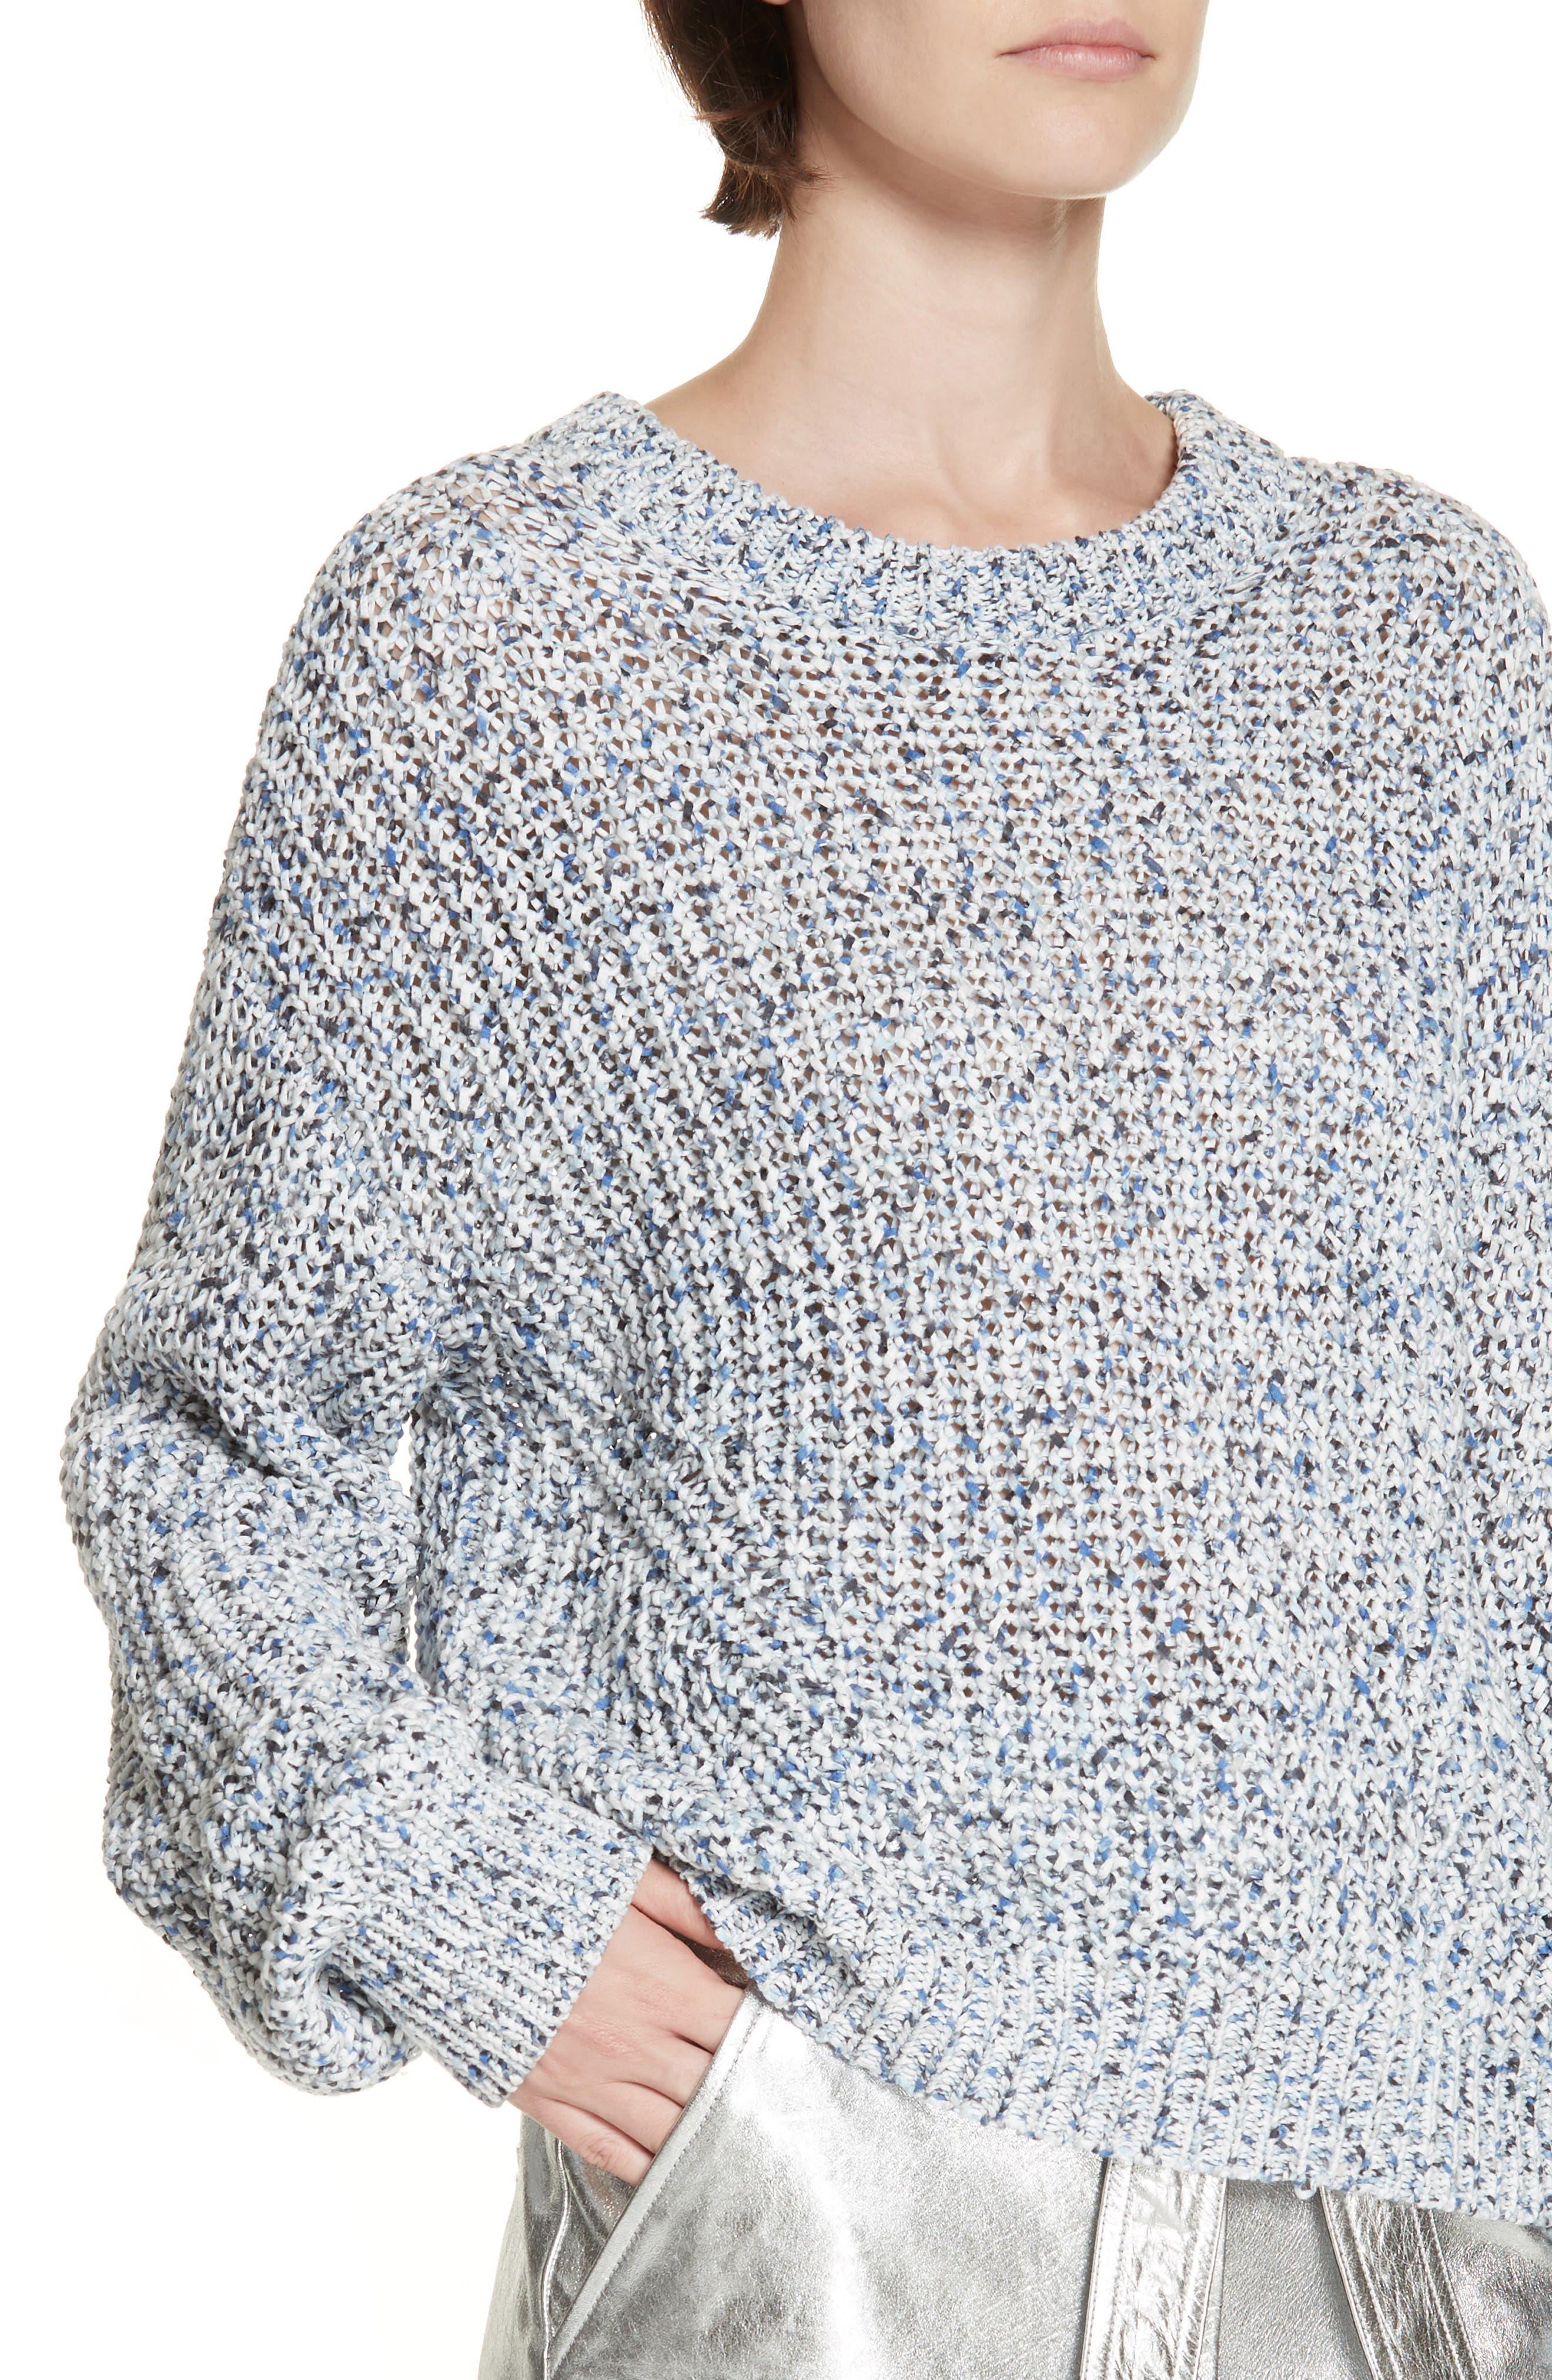 Ryce Cotton Sweater,                             Alternate thumbnail 4, color,                             BLUE MULIT